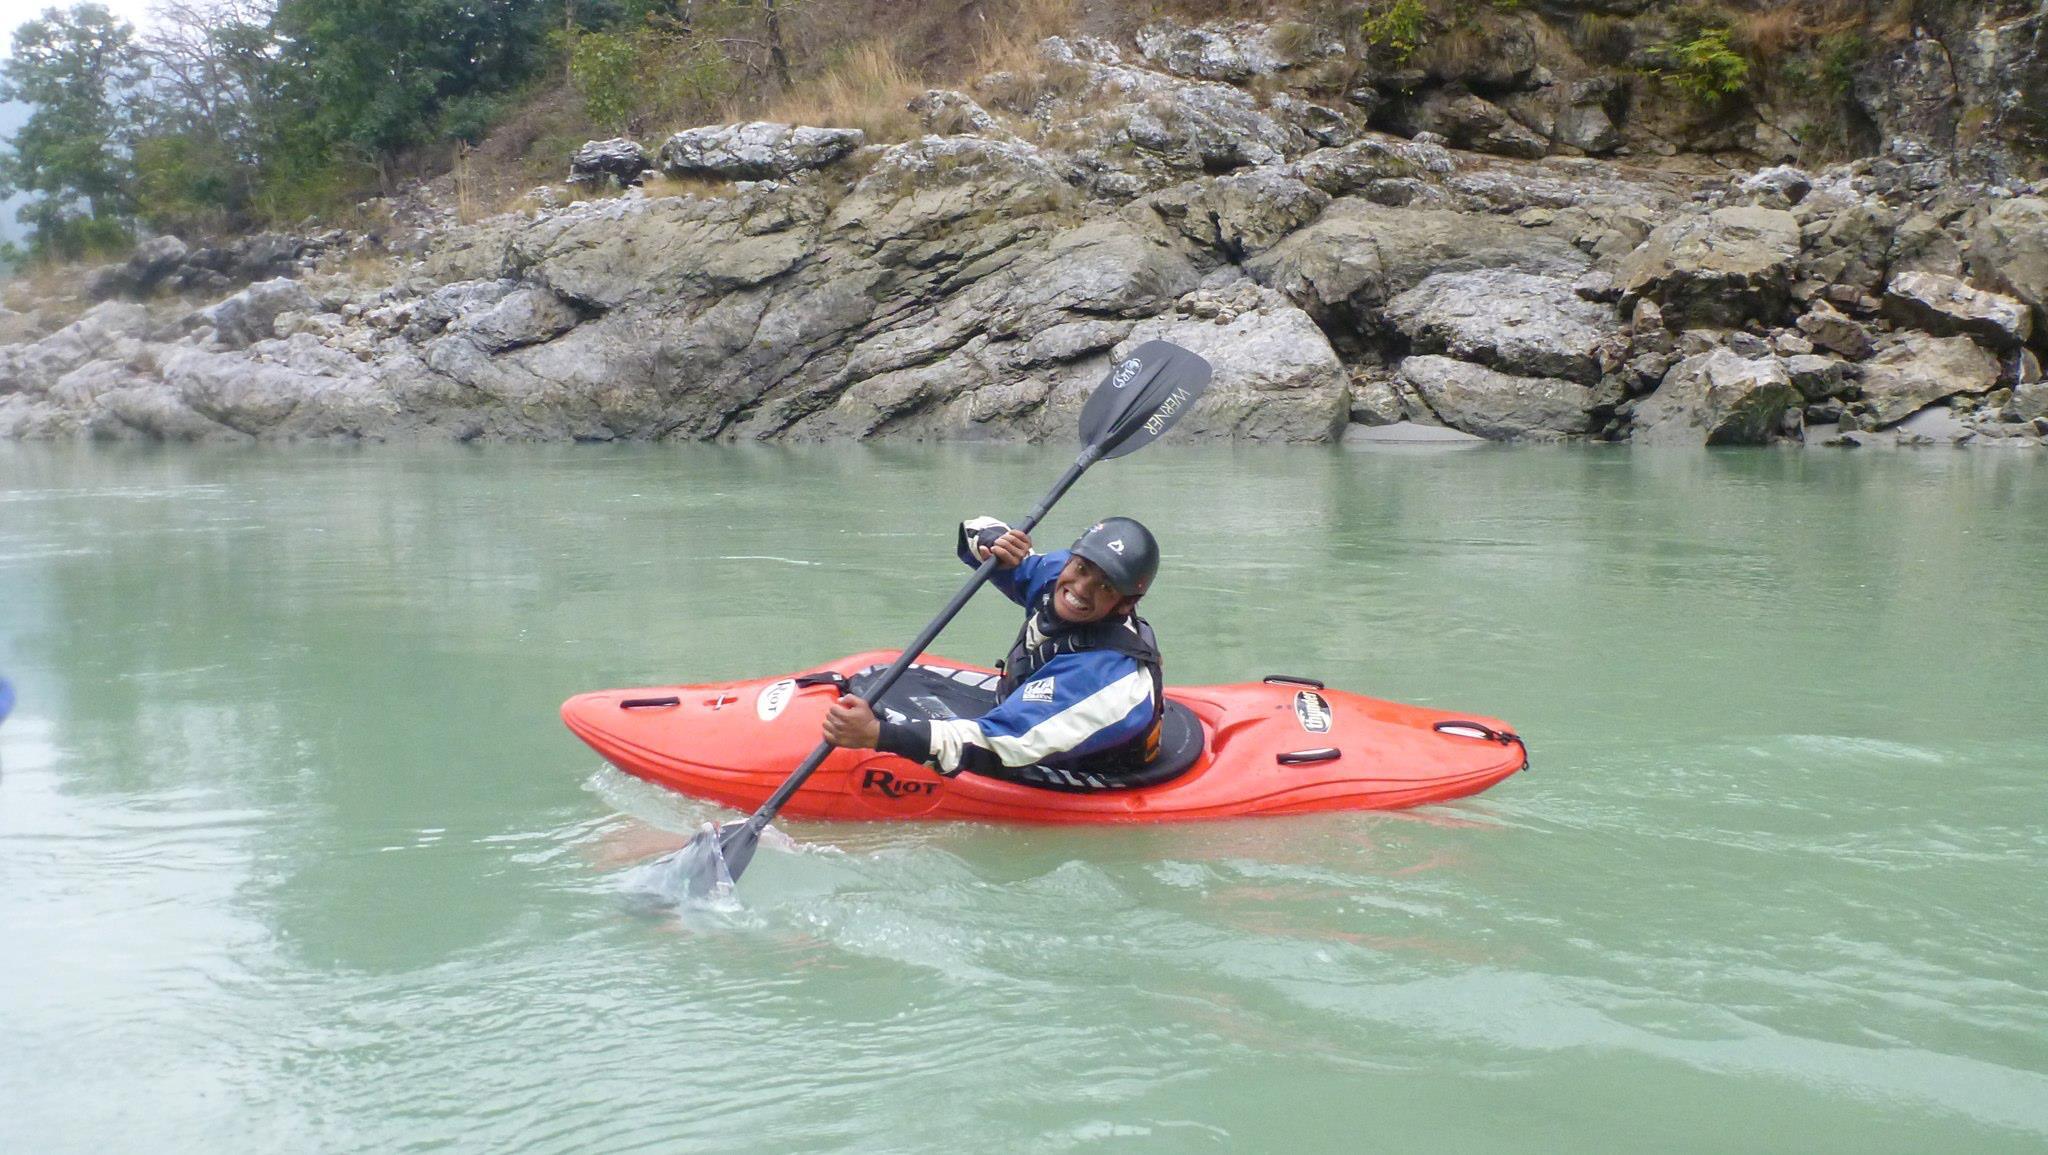 Pramod Magar, River Guide + Kayak Instructor